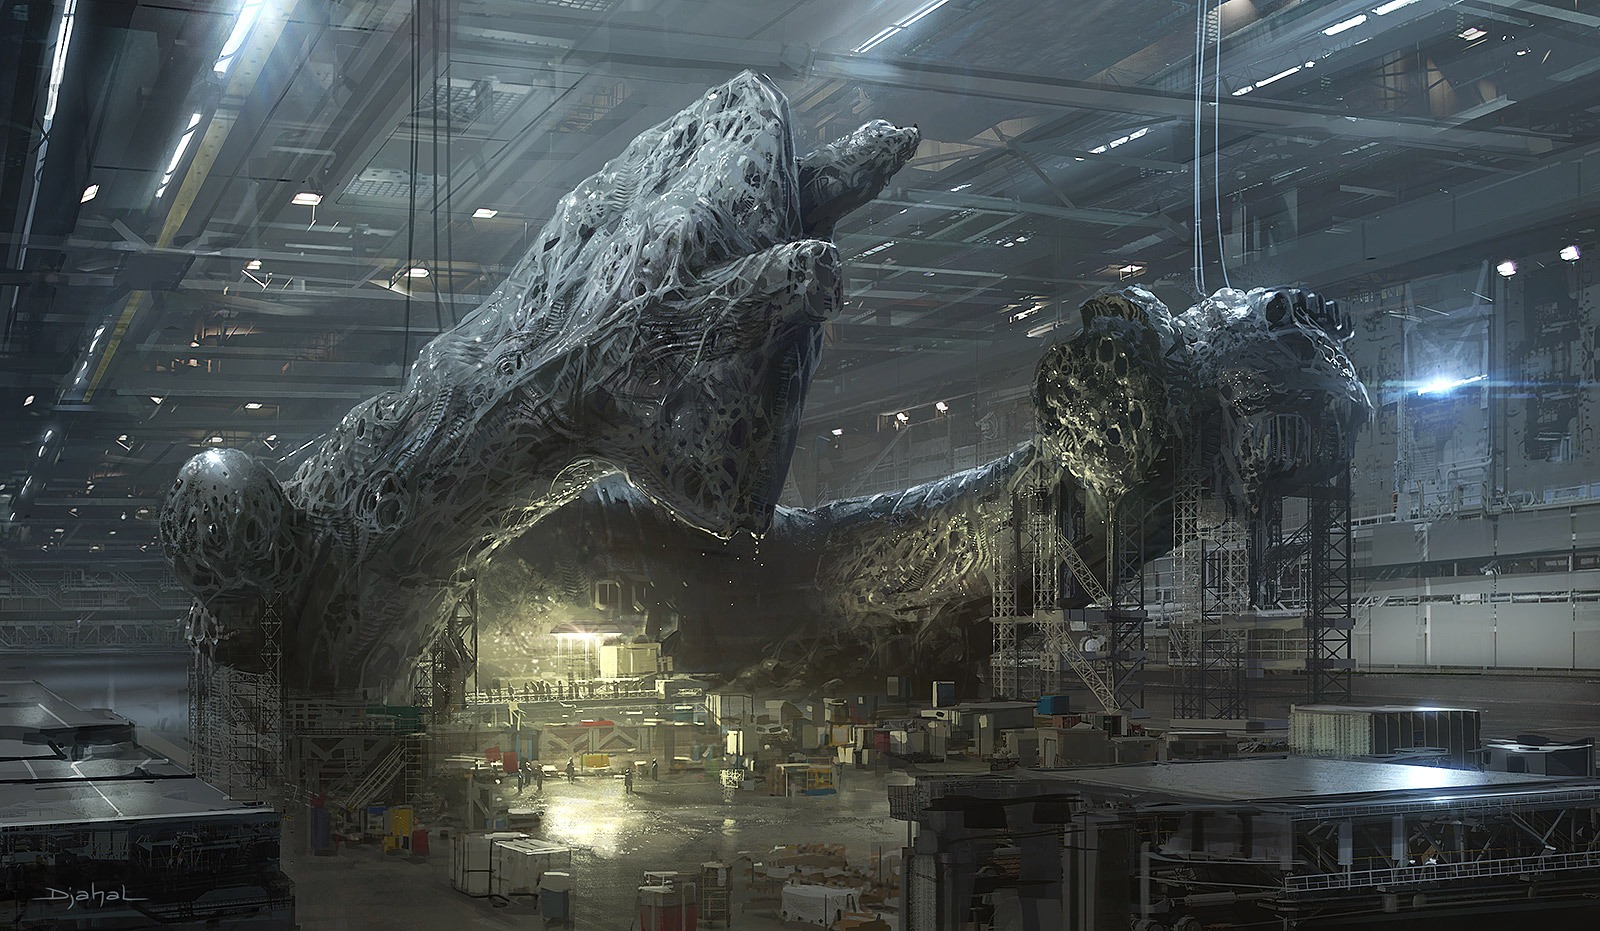 Alien: Covenant Screensavers